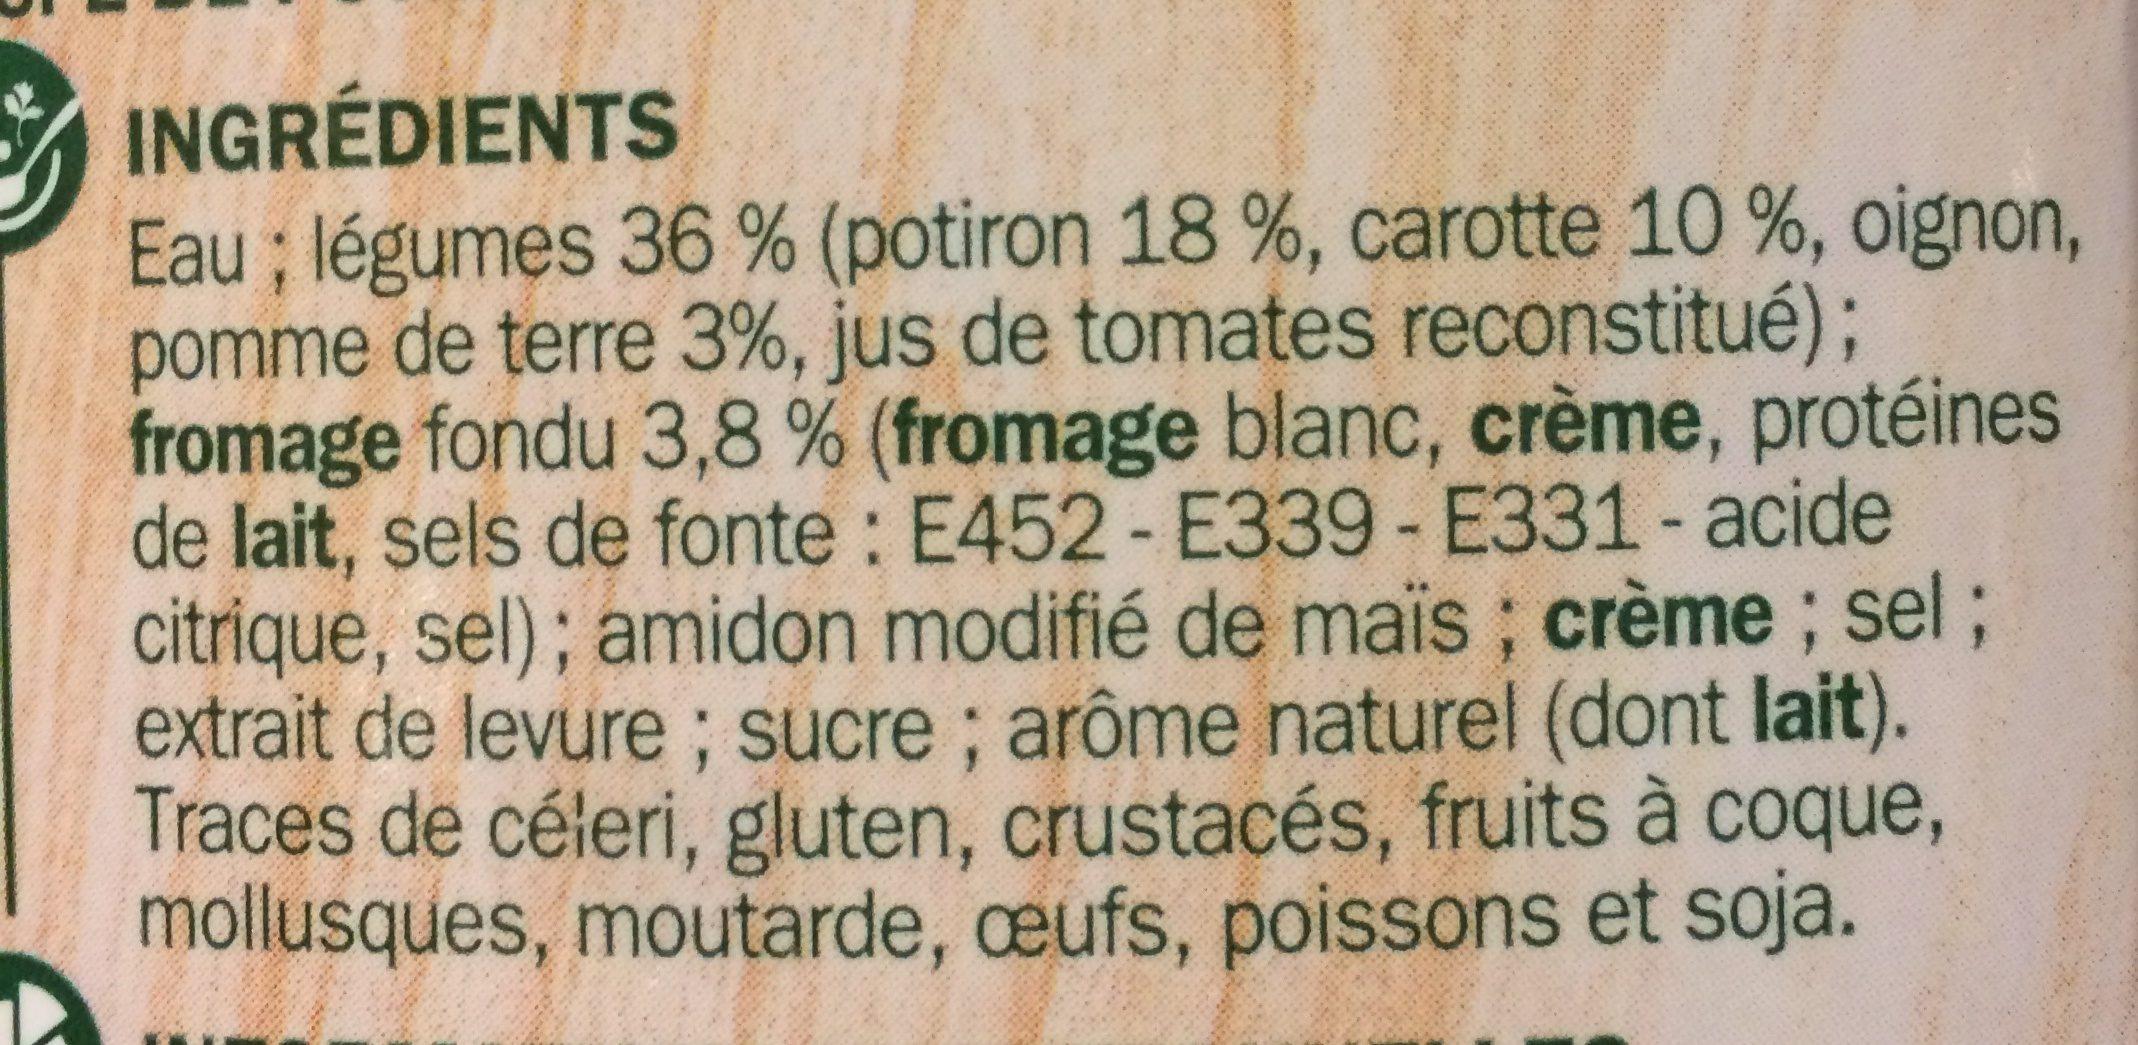 Velouté potiron fromage fondu - Ingrédients - fr